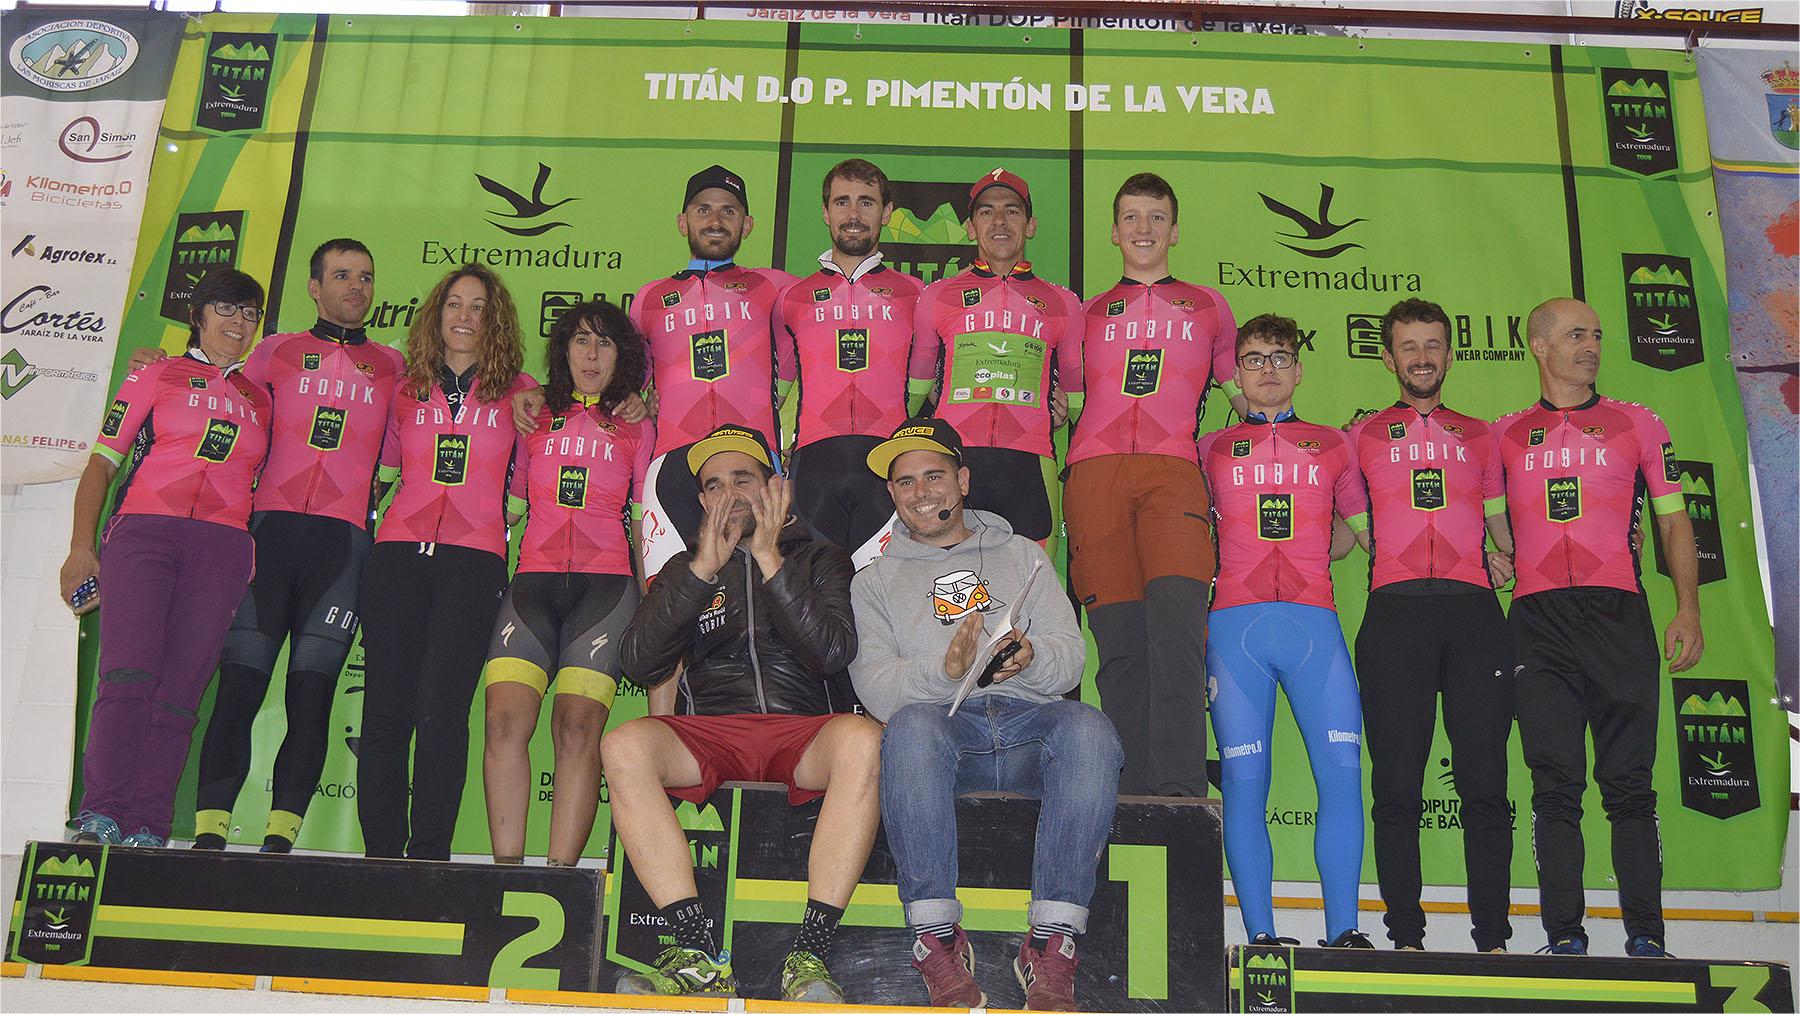 titanjaraiz18_vencedores finales Titan2018